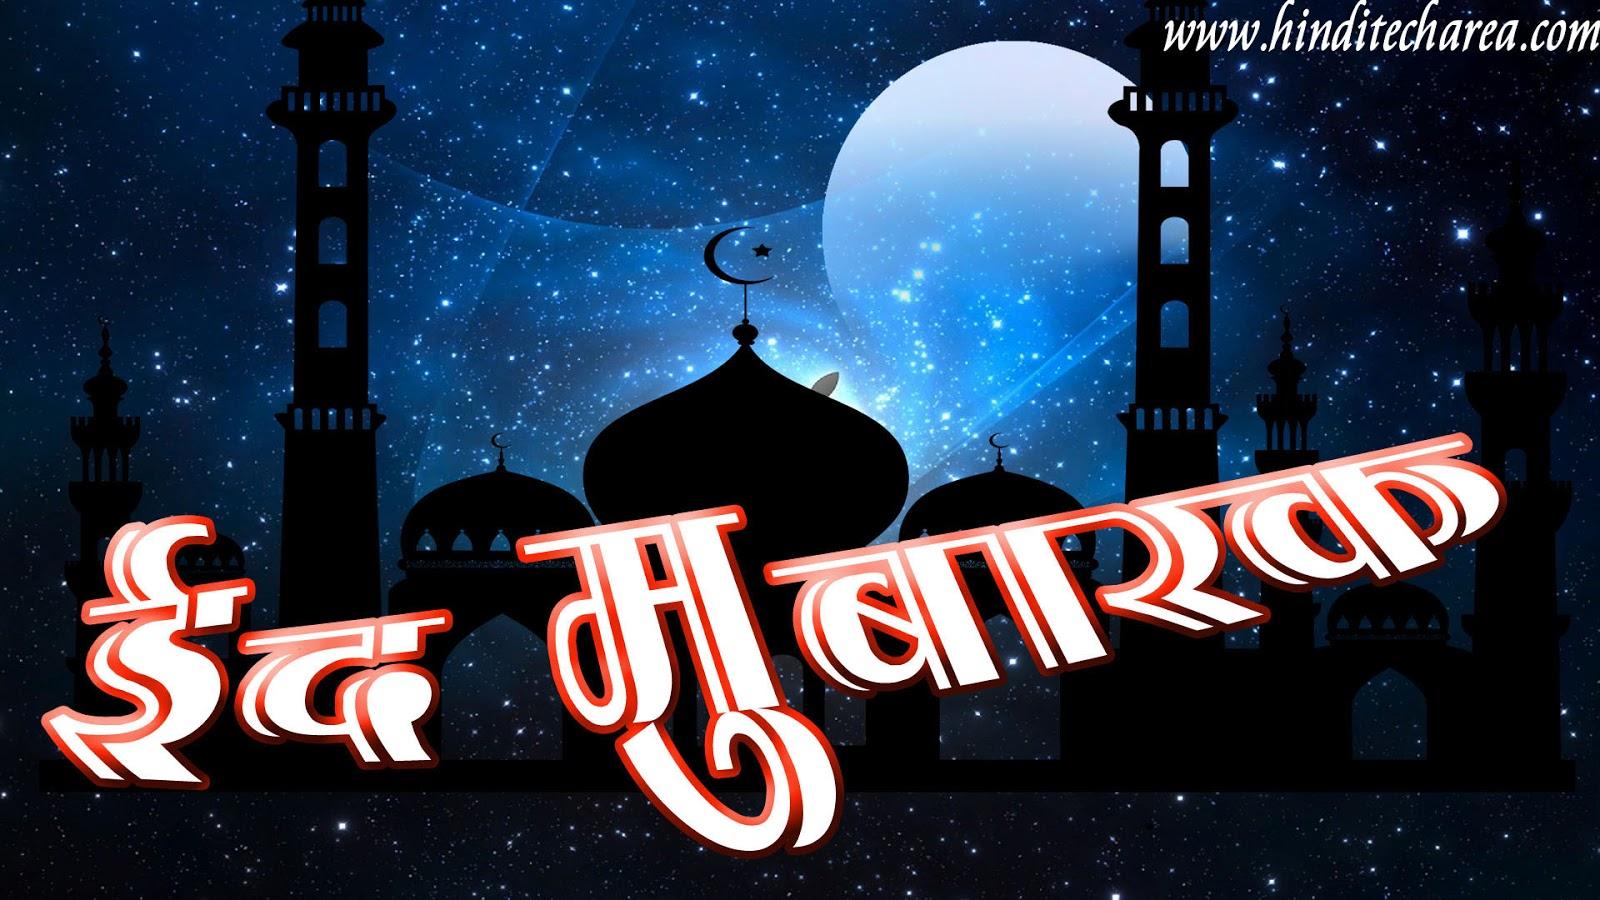 Hd wallpaper eid mubarak - Top 15 Eid Mubarak Greeting Cards And Hd Wallpaper Eid Mubarak Photos Download Eid Mubarak Greeting